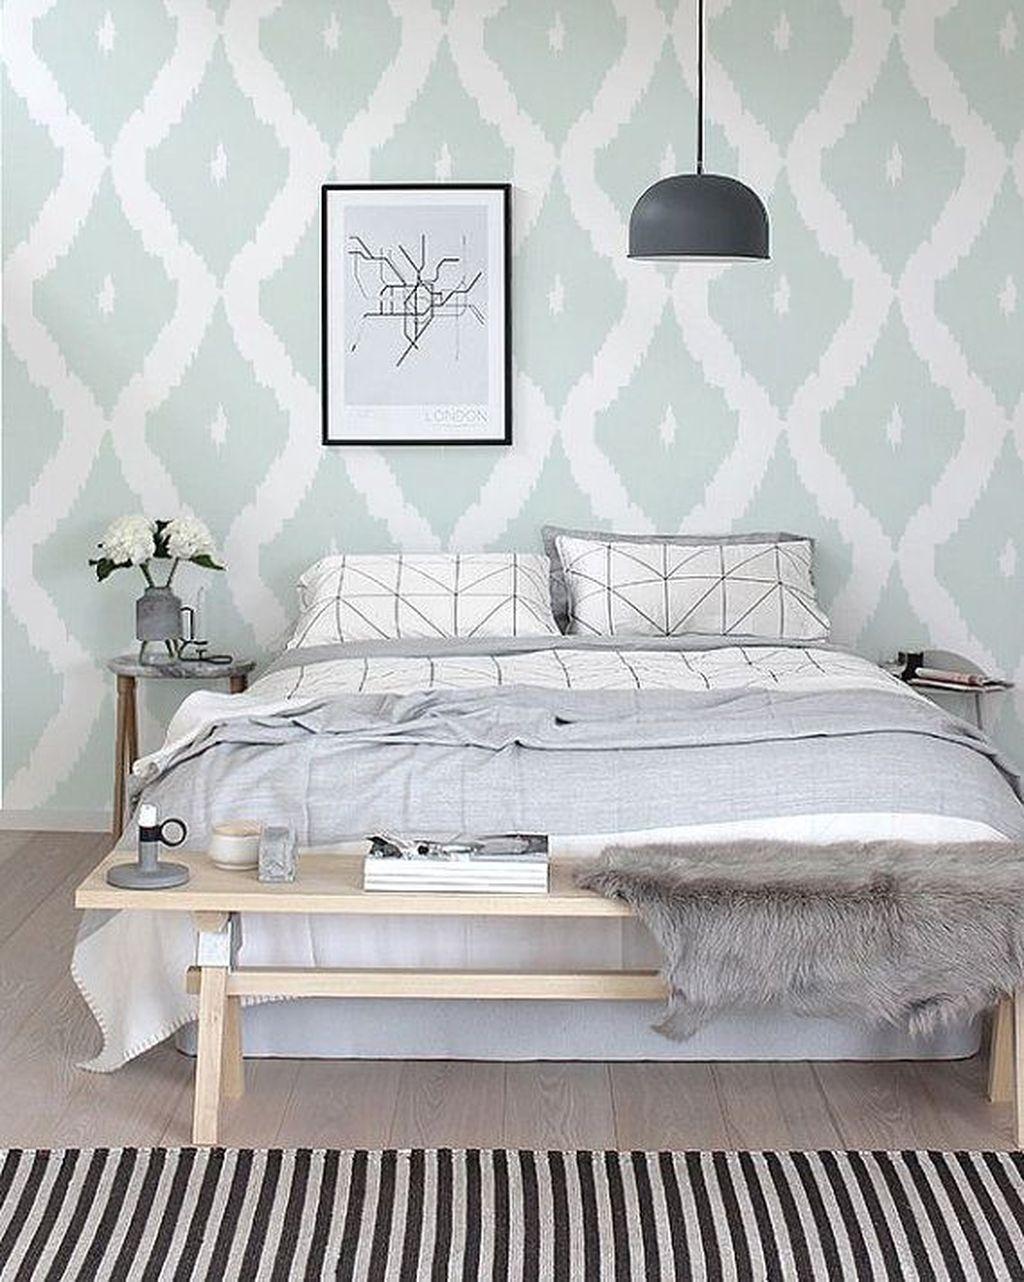 Minimalist Scandinavian Bedroom Decor Ideas 33